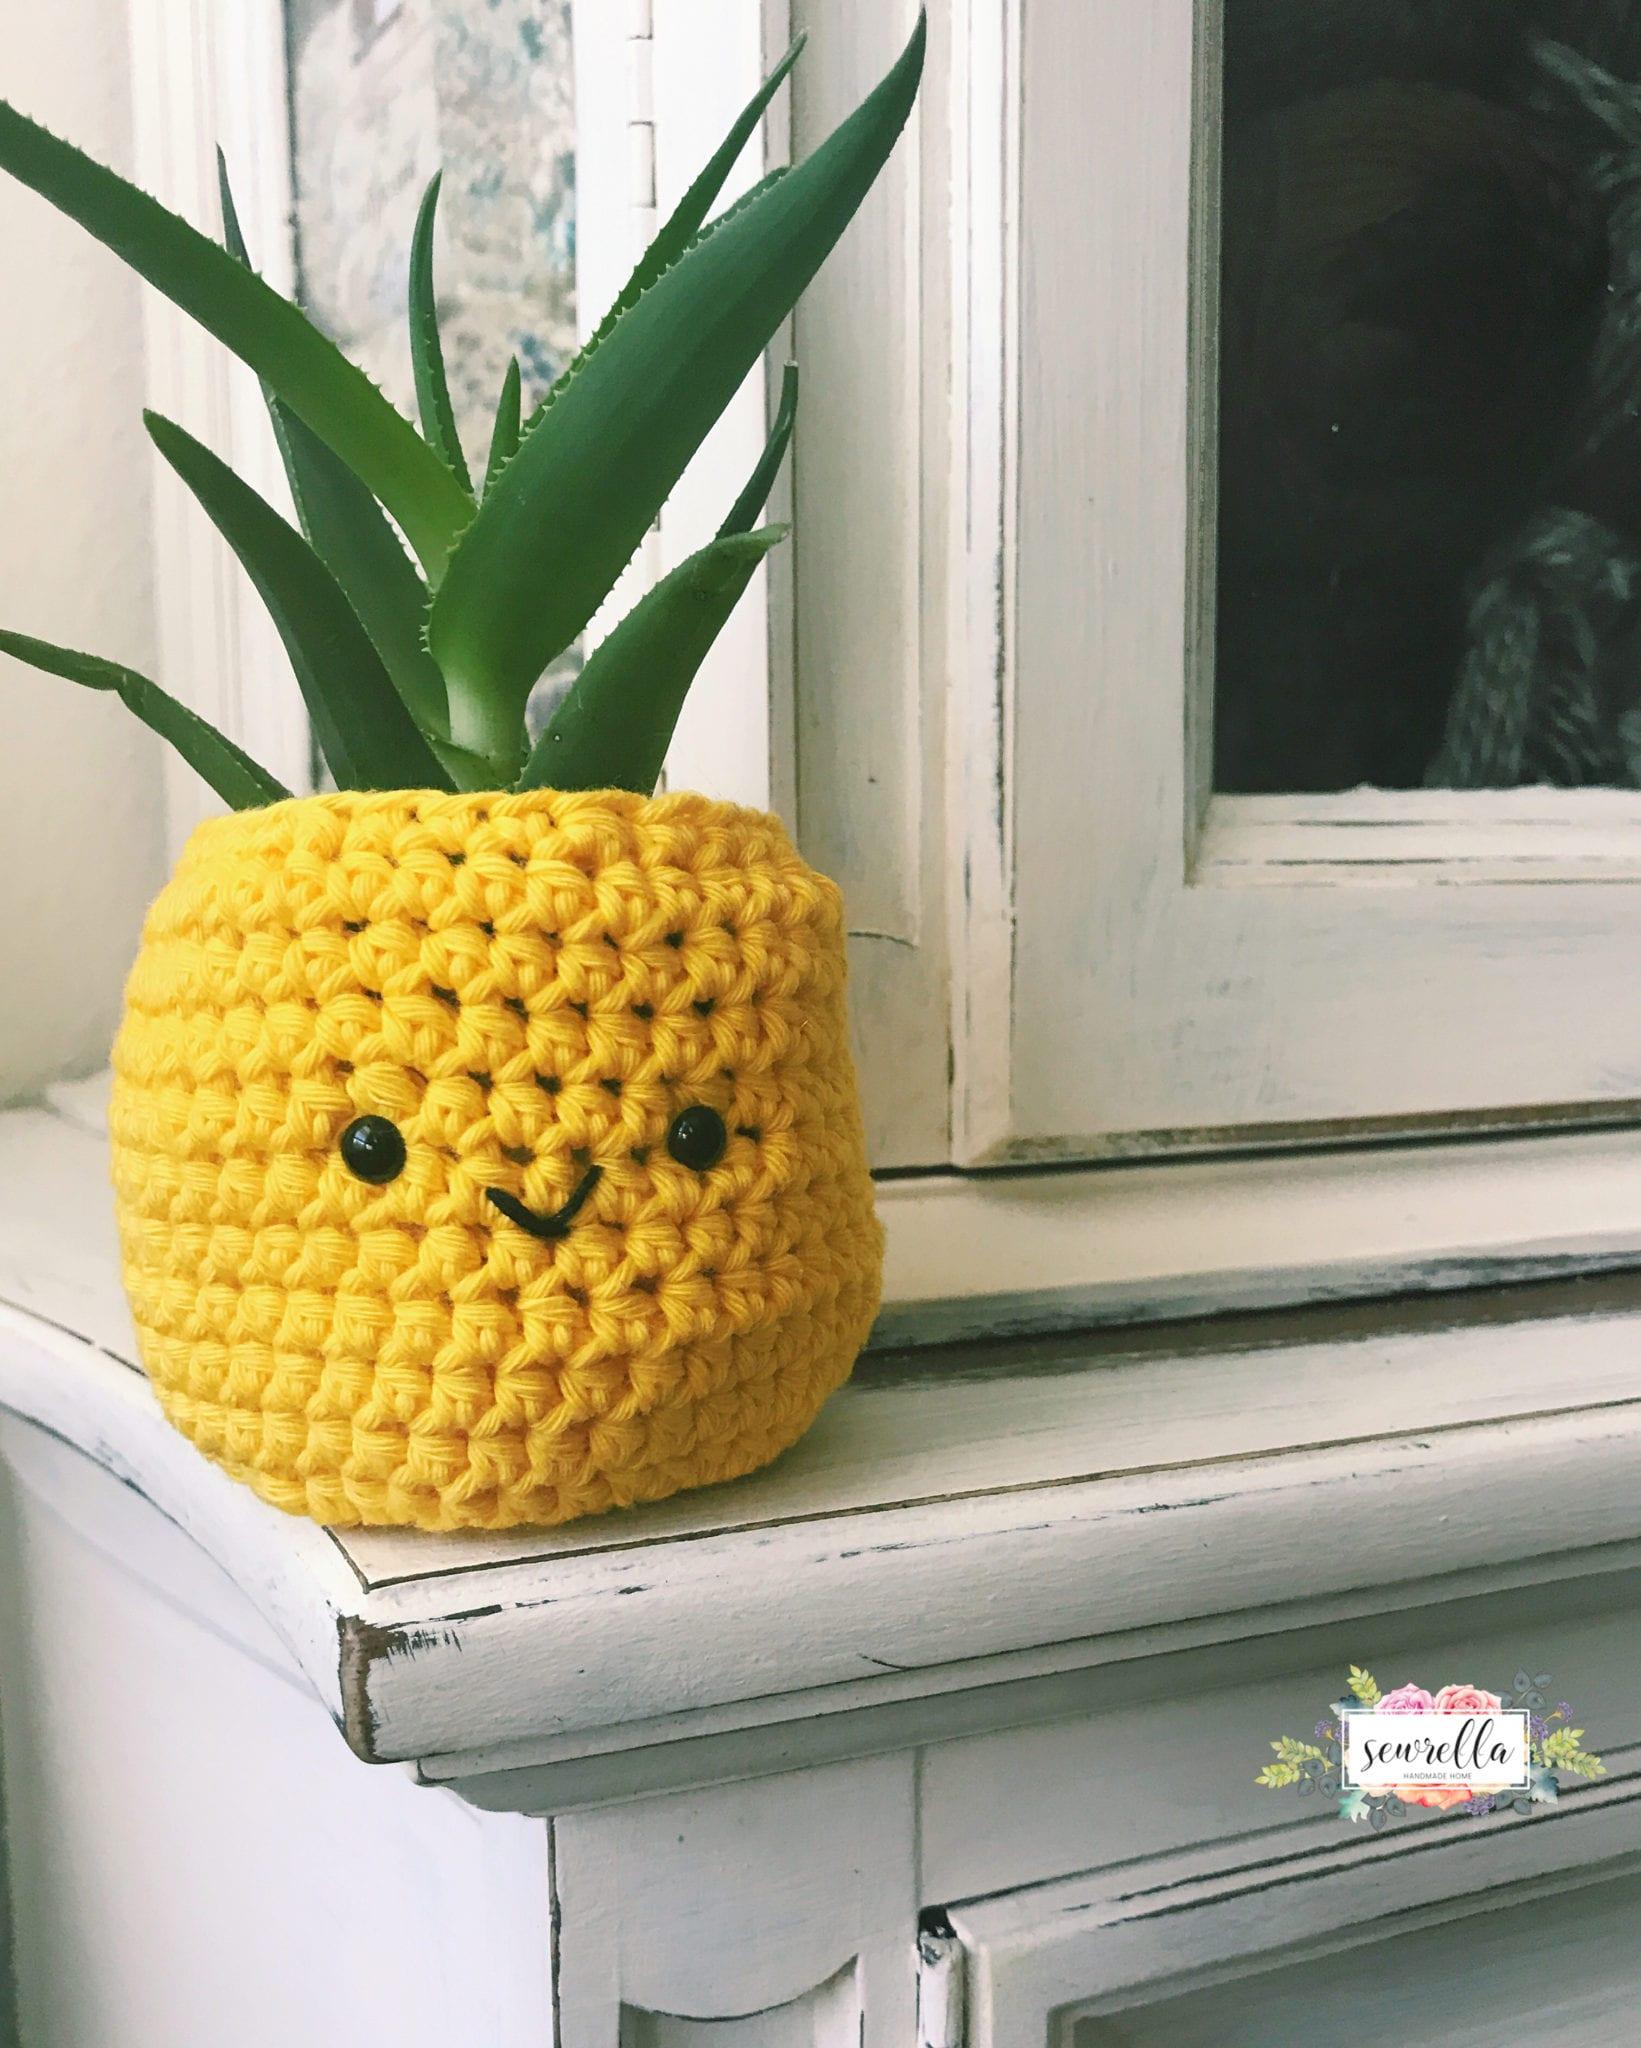 Crochet Pineapple Planter Sewrella